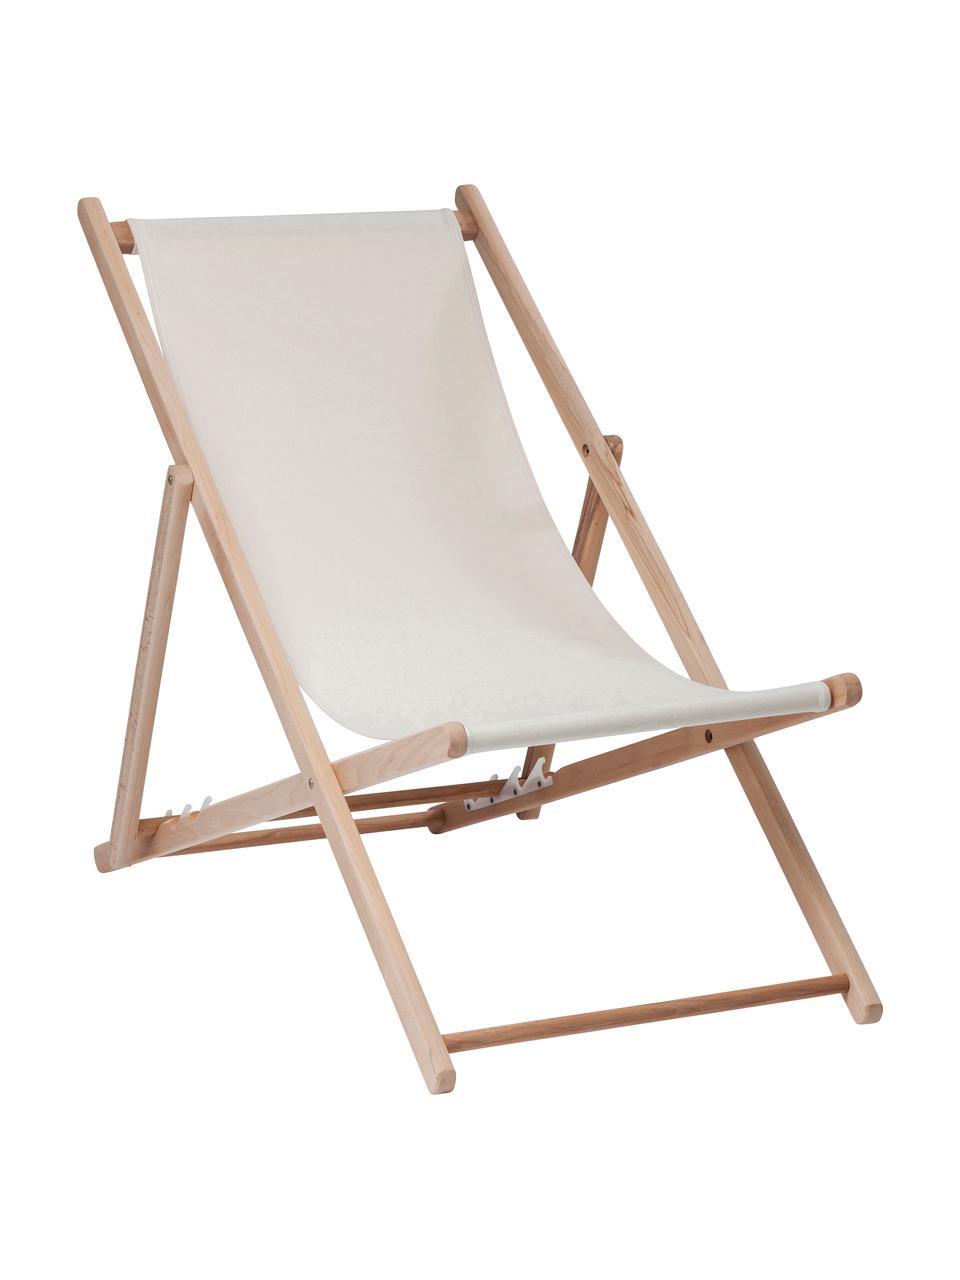 Transat rabattable Hot Summer, Beige, bois de hêtre